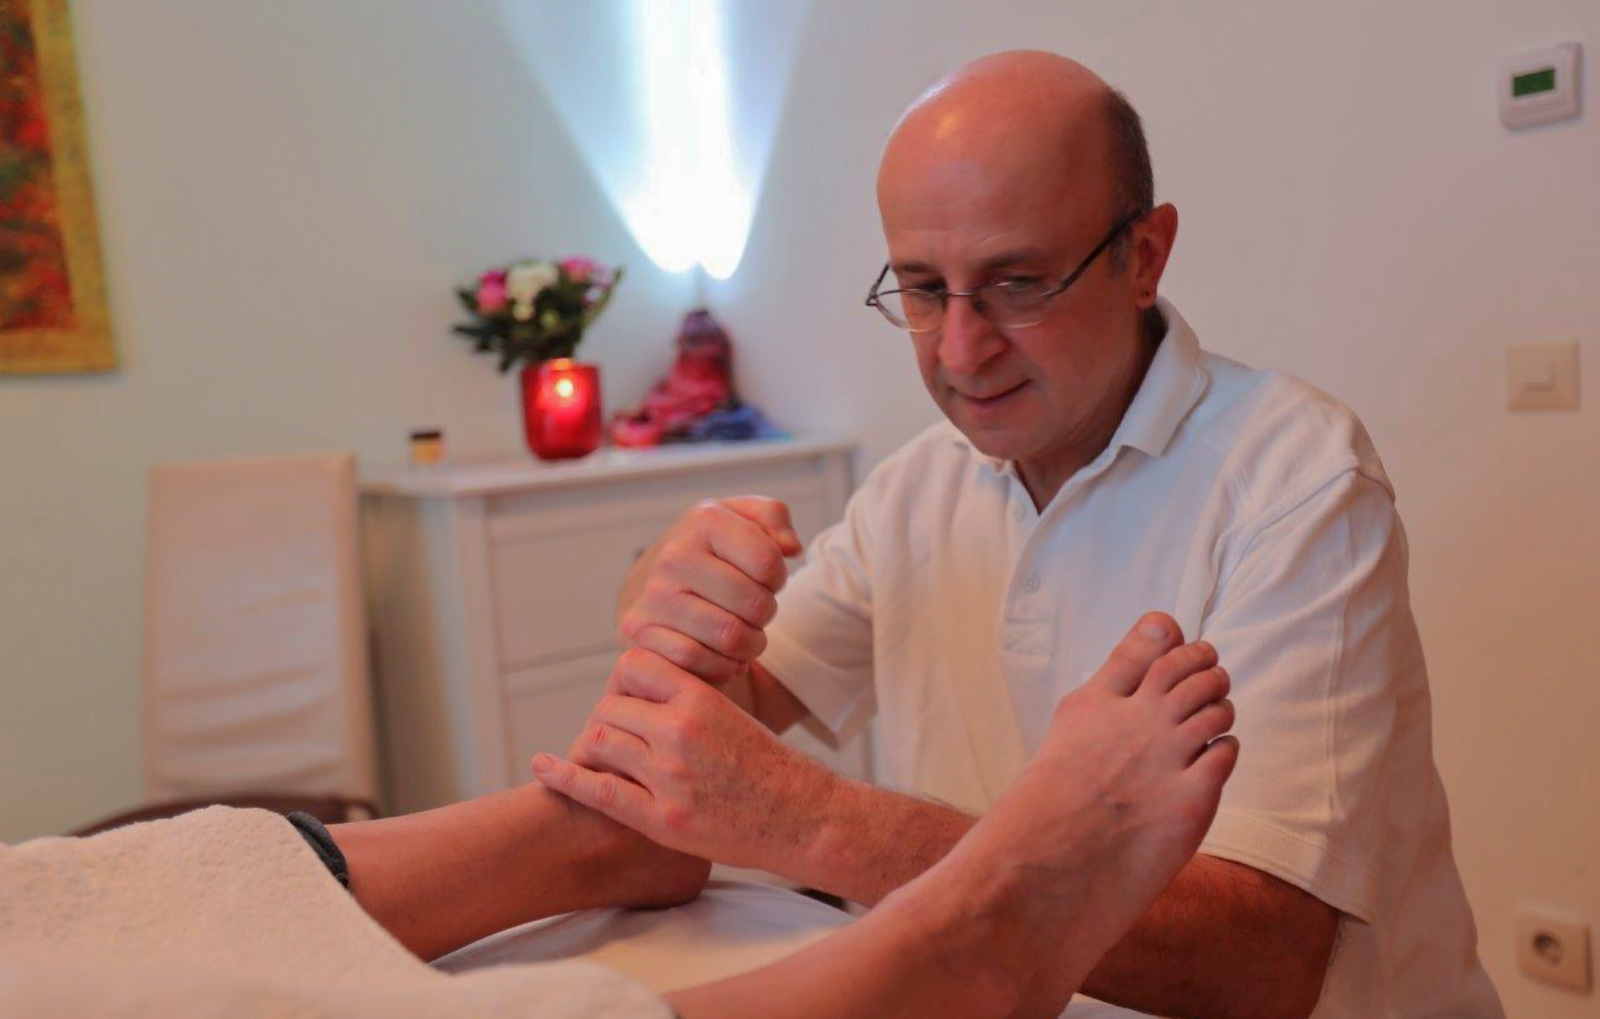 fussreflexzonen-massage-bg3